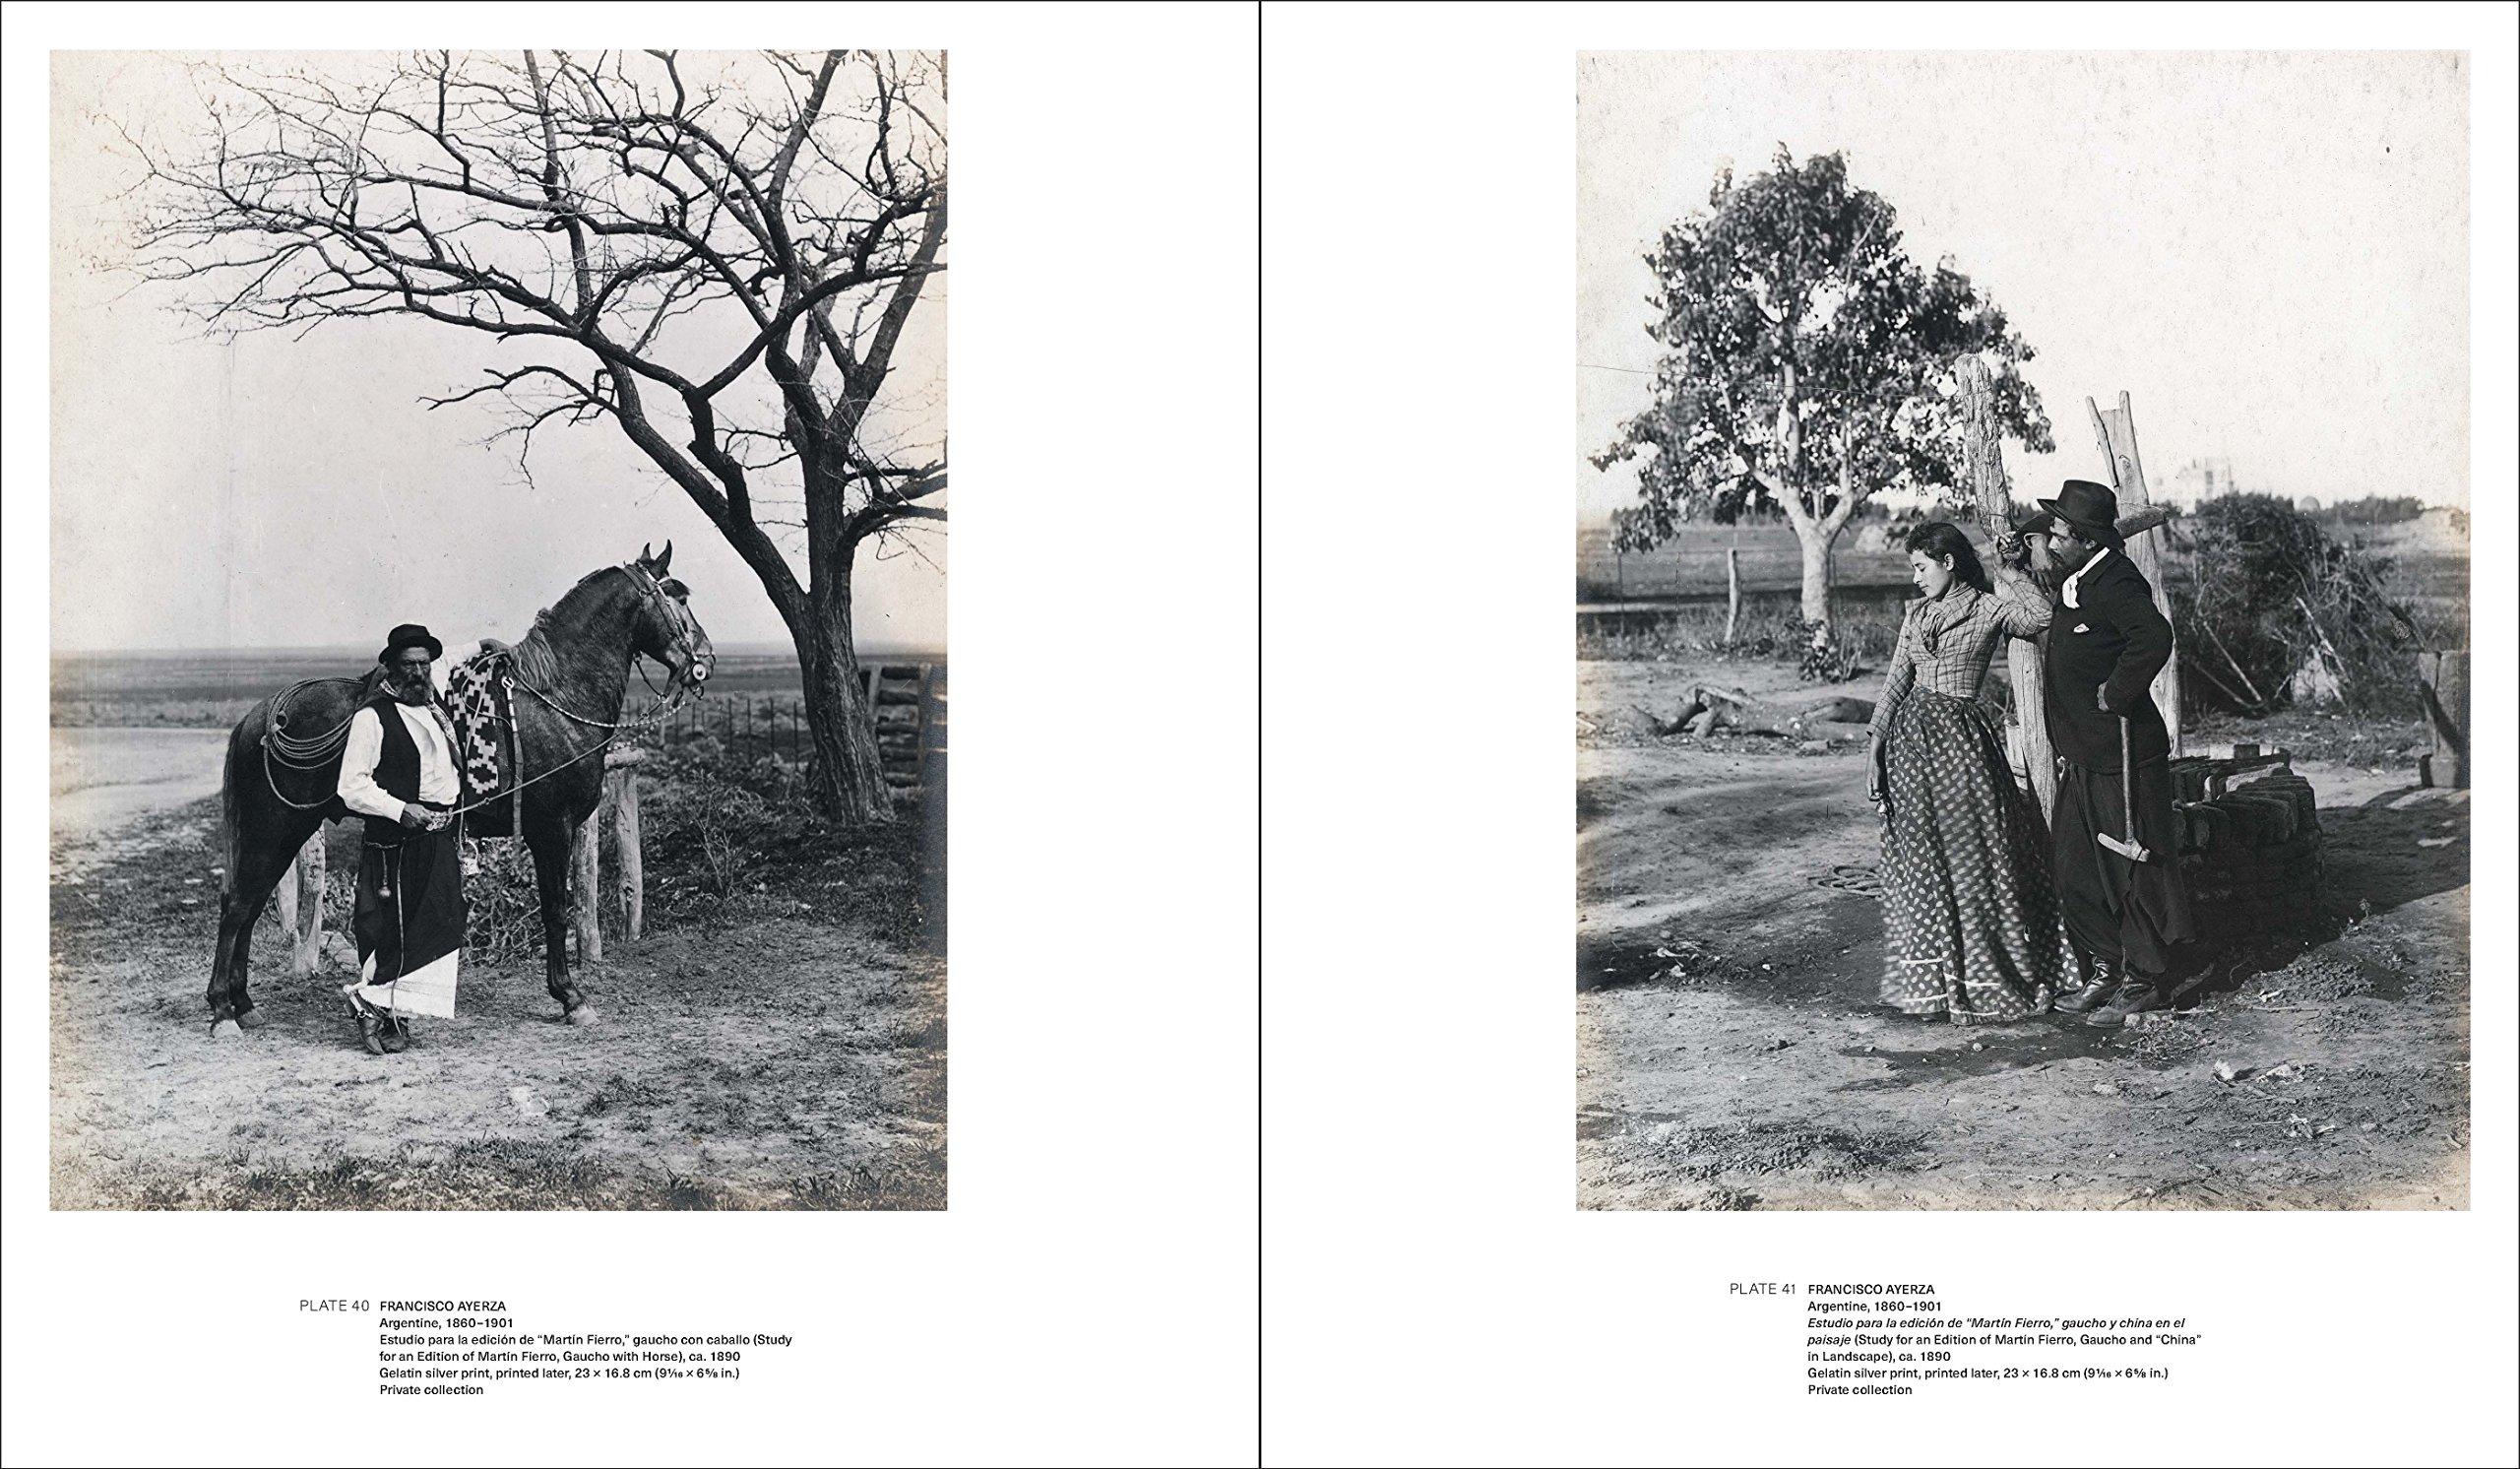 Photography in Argentina - Contradiction and Continuity: Amazon.es: Idurre Alonso, Judith Keller: Libros en idiomas extranjeros